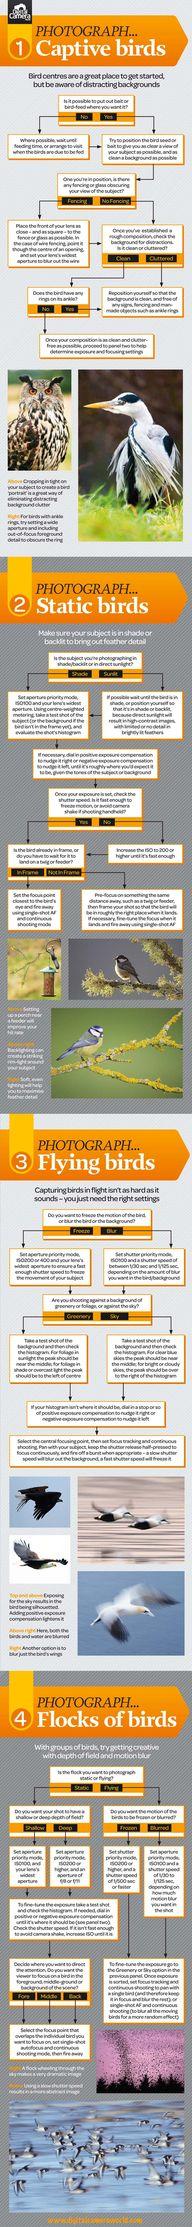 Free bird photograph